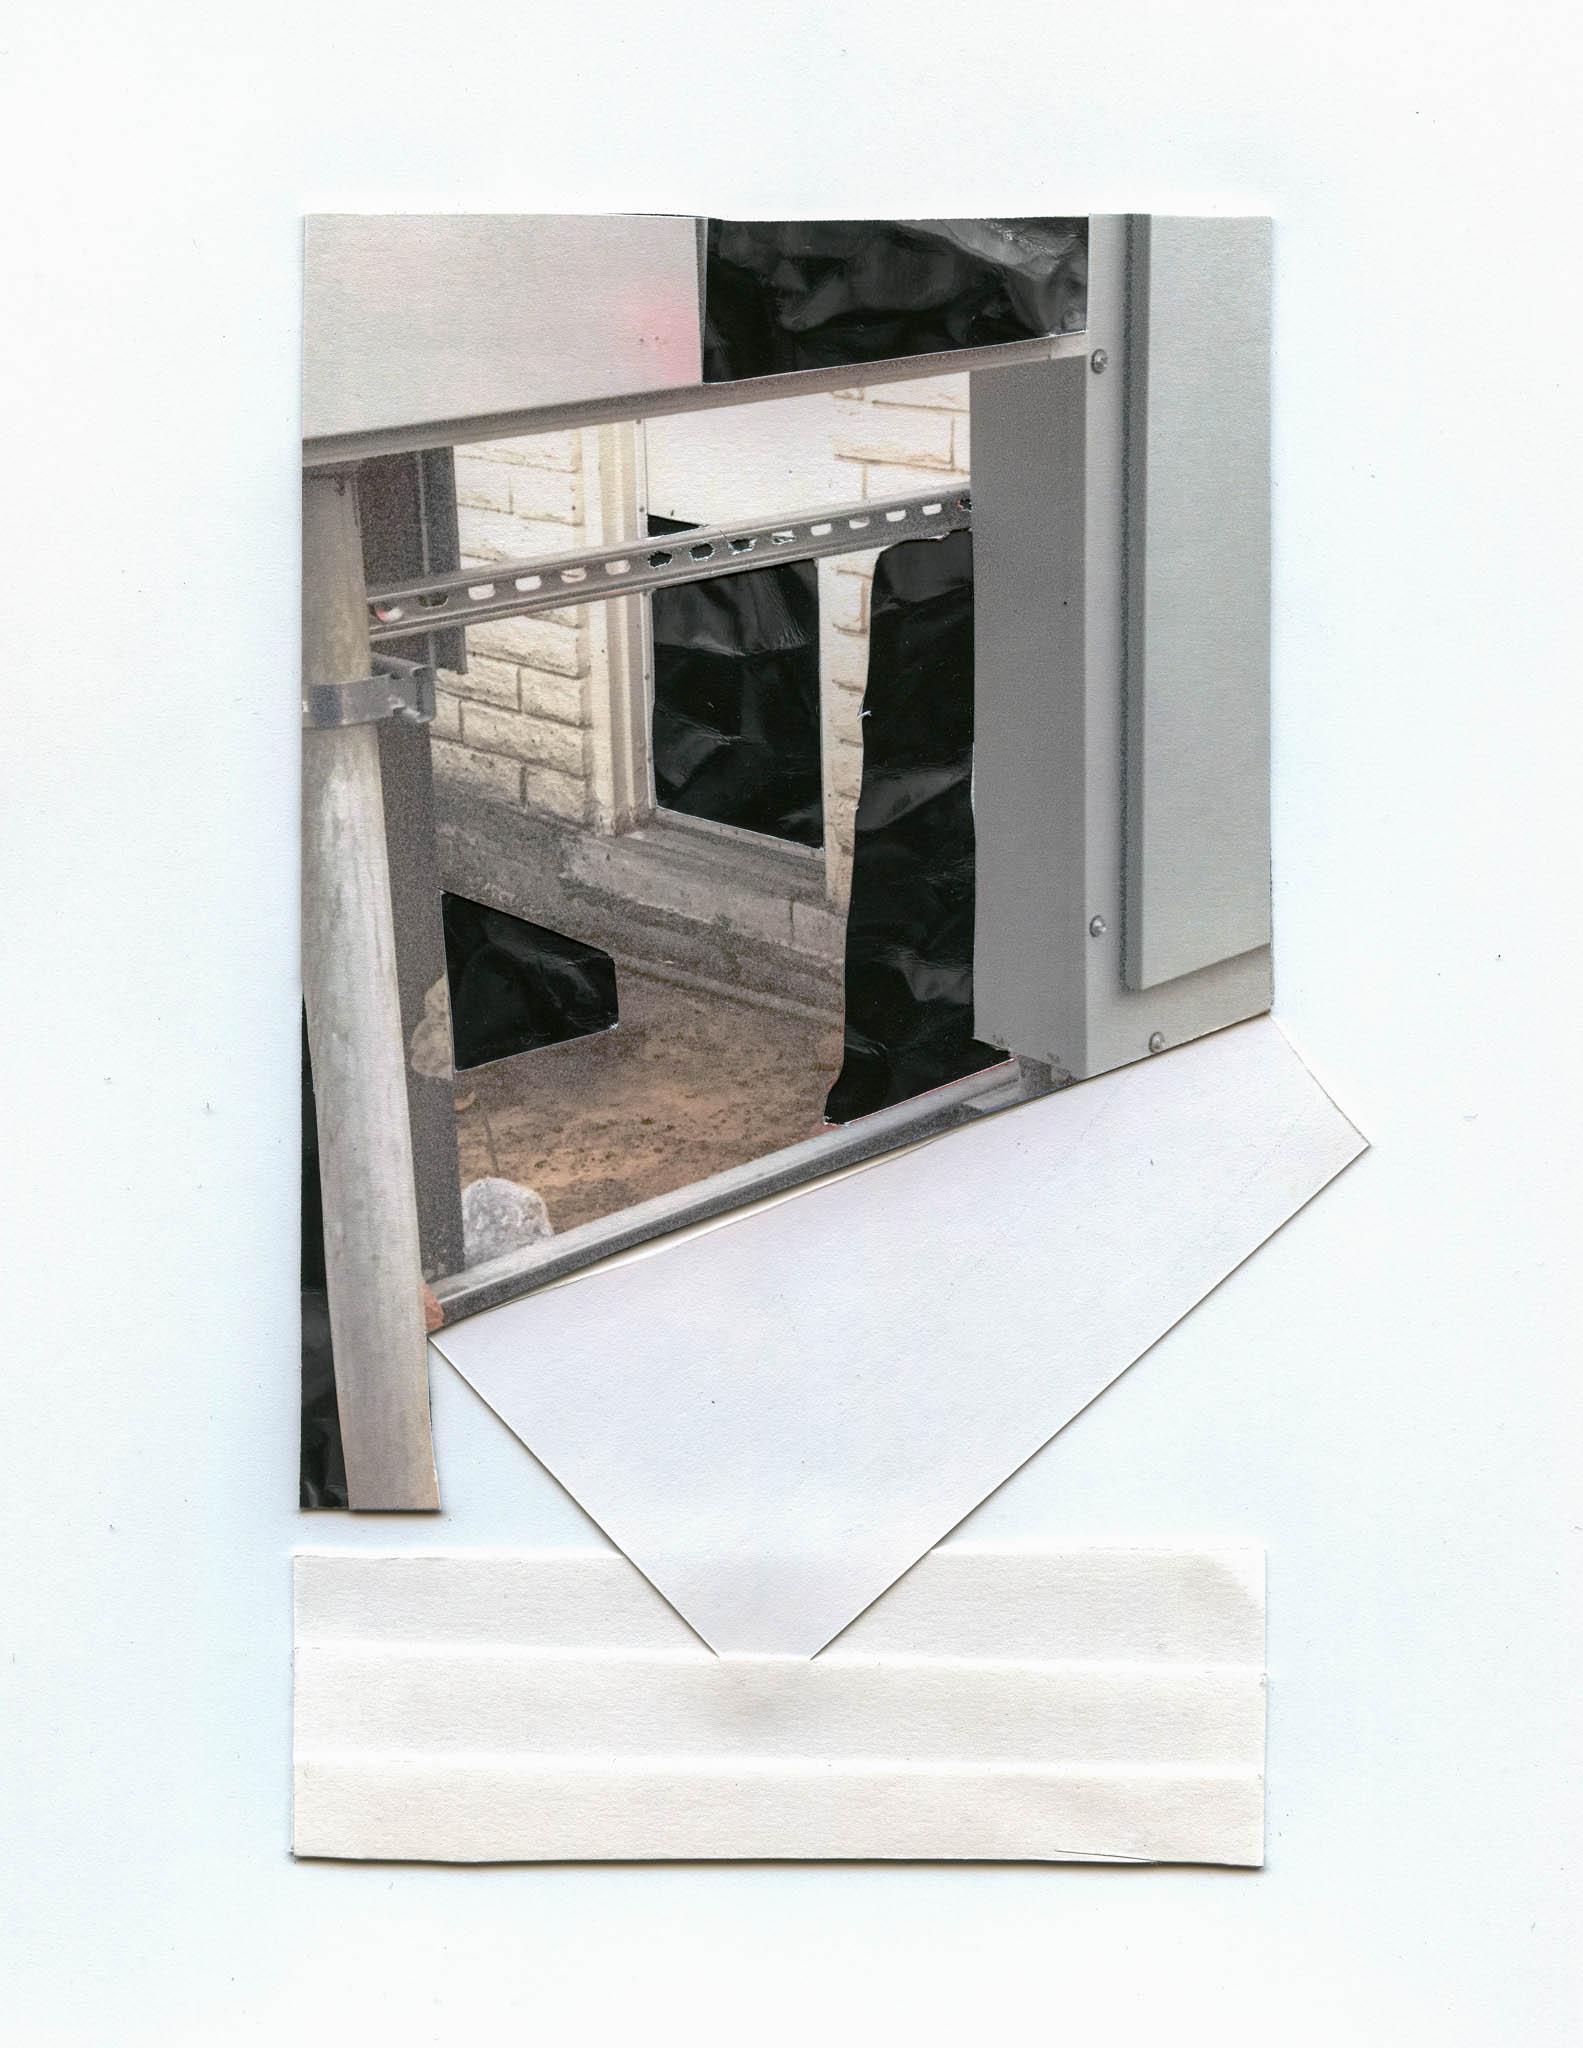 squarespace-17.jpg